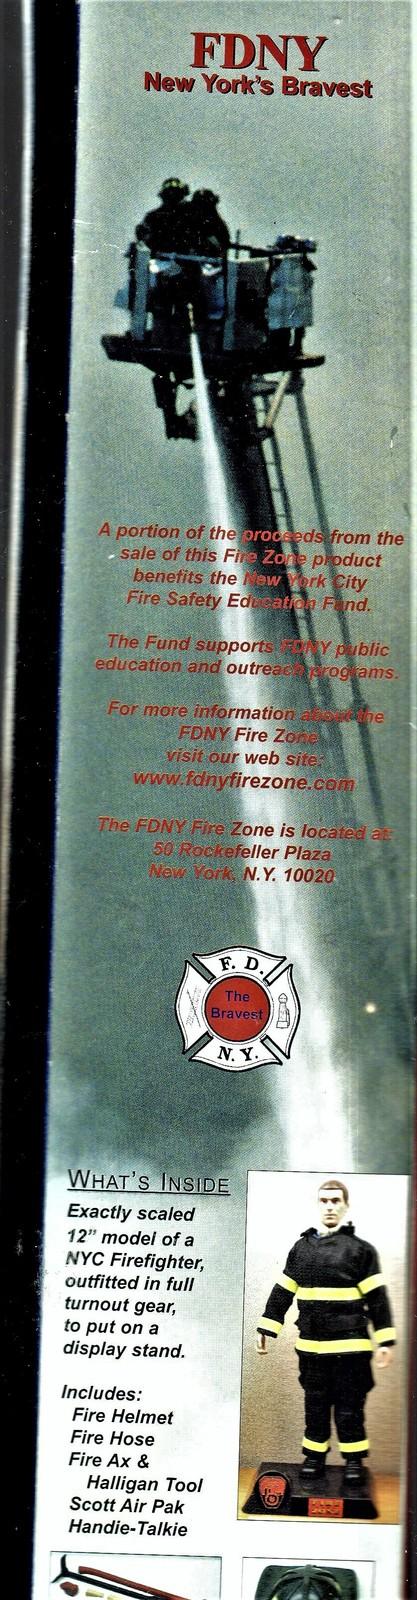 F.D.N.Y. Fireman - Fire Zone - (New Yotk's Bravest)